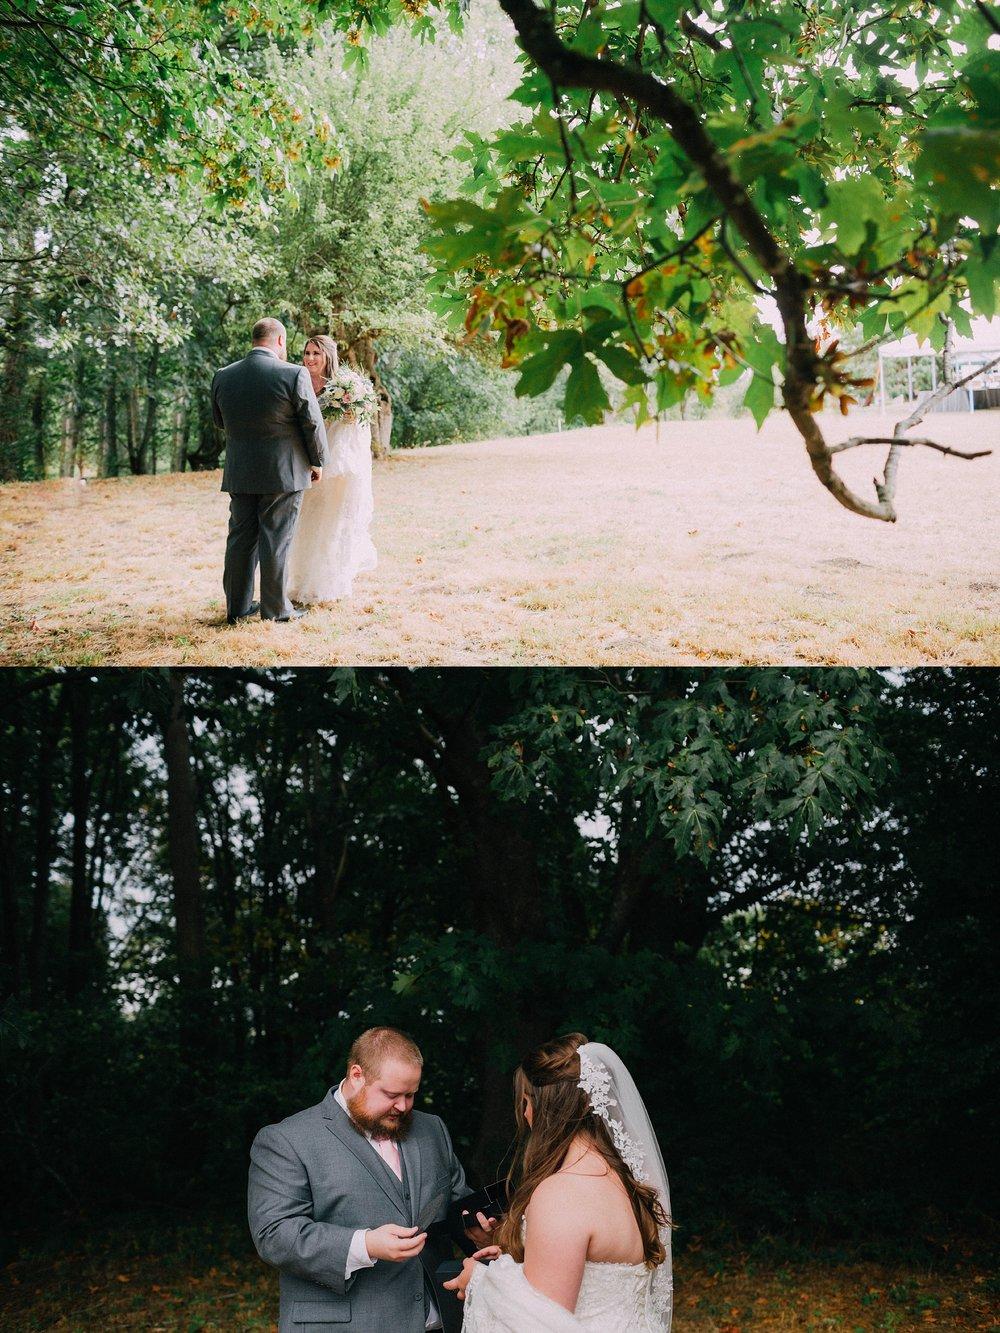 karisa ryan - vashon island backyard wedding photographer - seattle area backyard wedding photography - ashley vos-8.jpg